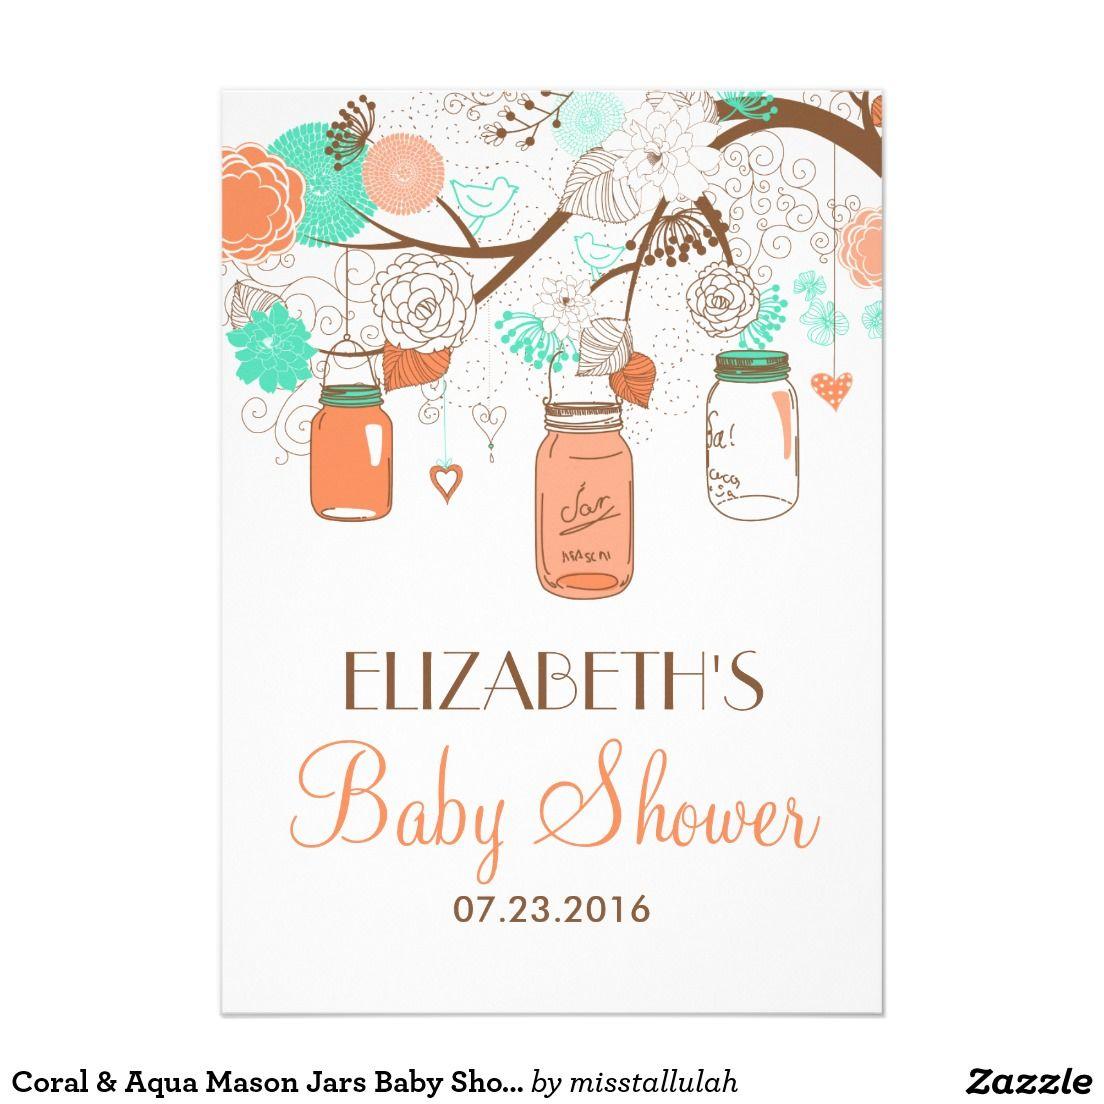 Coral & Aqua Mason Jars Baby Shower Invitation. Artwork designed by ...